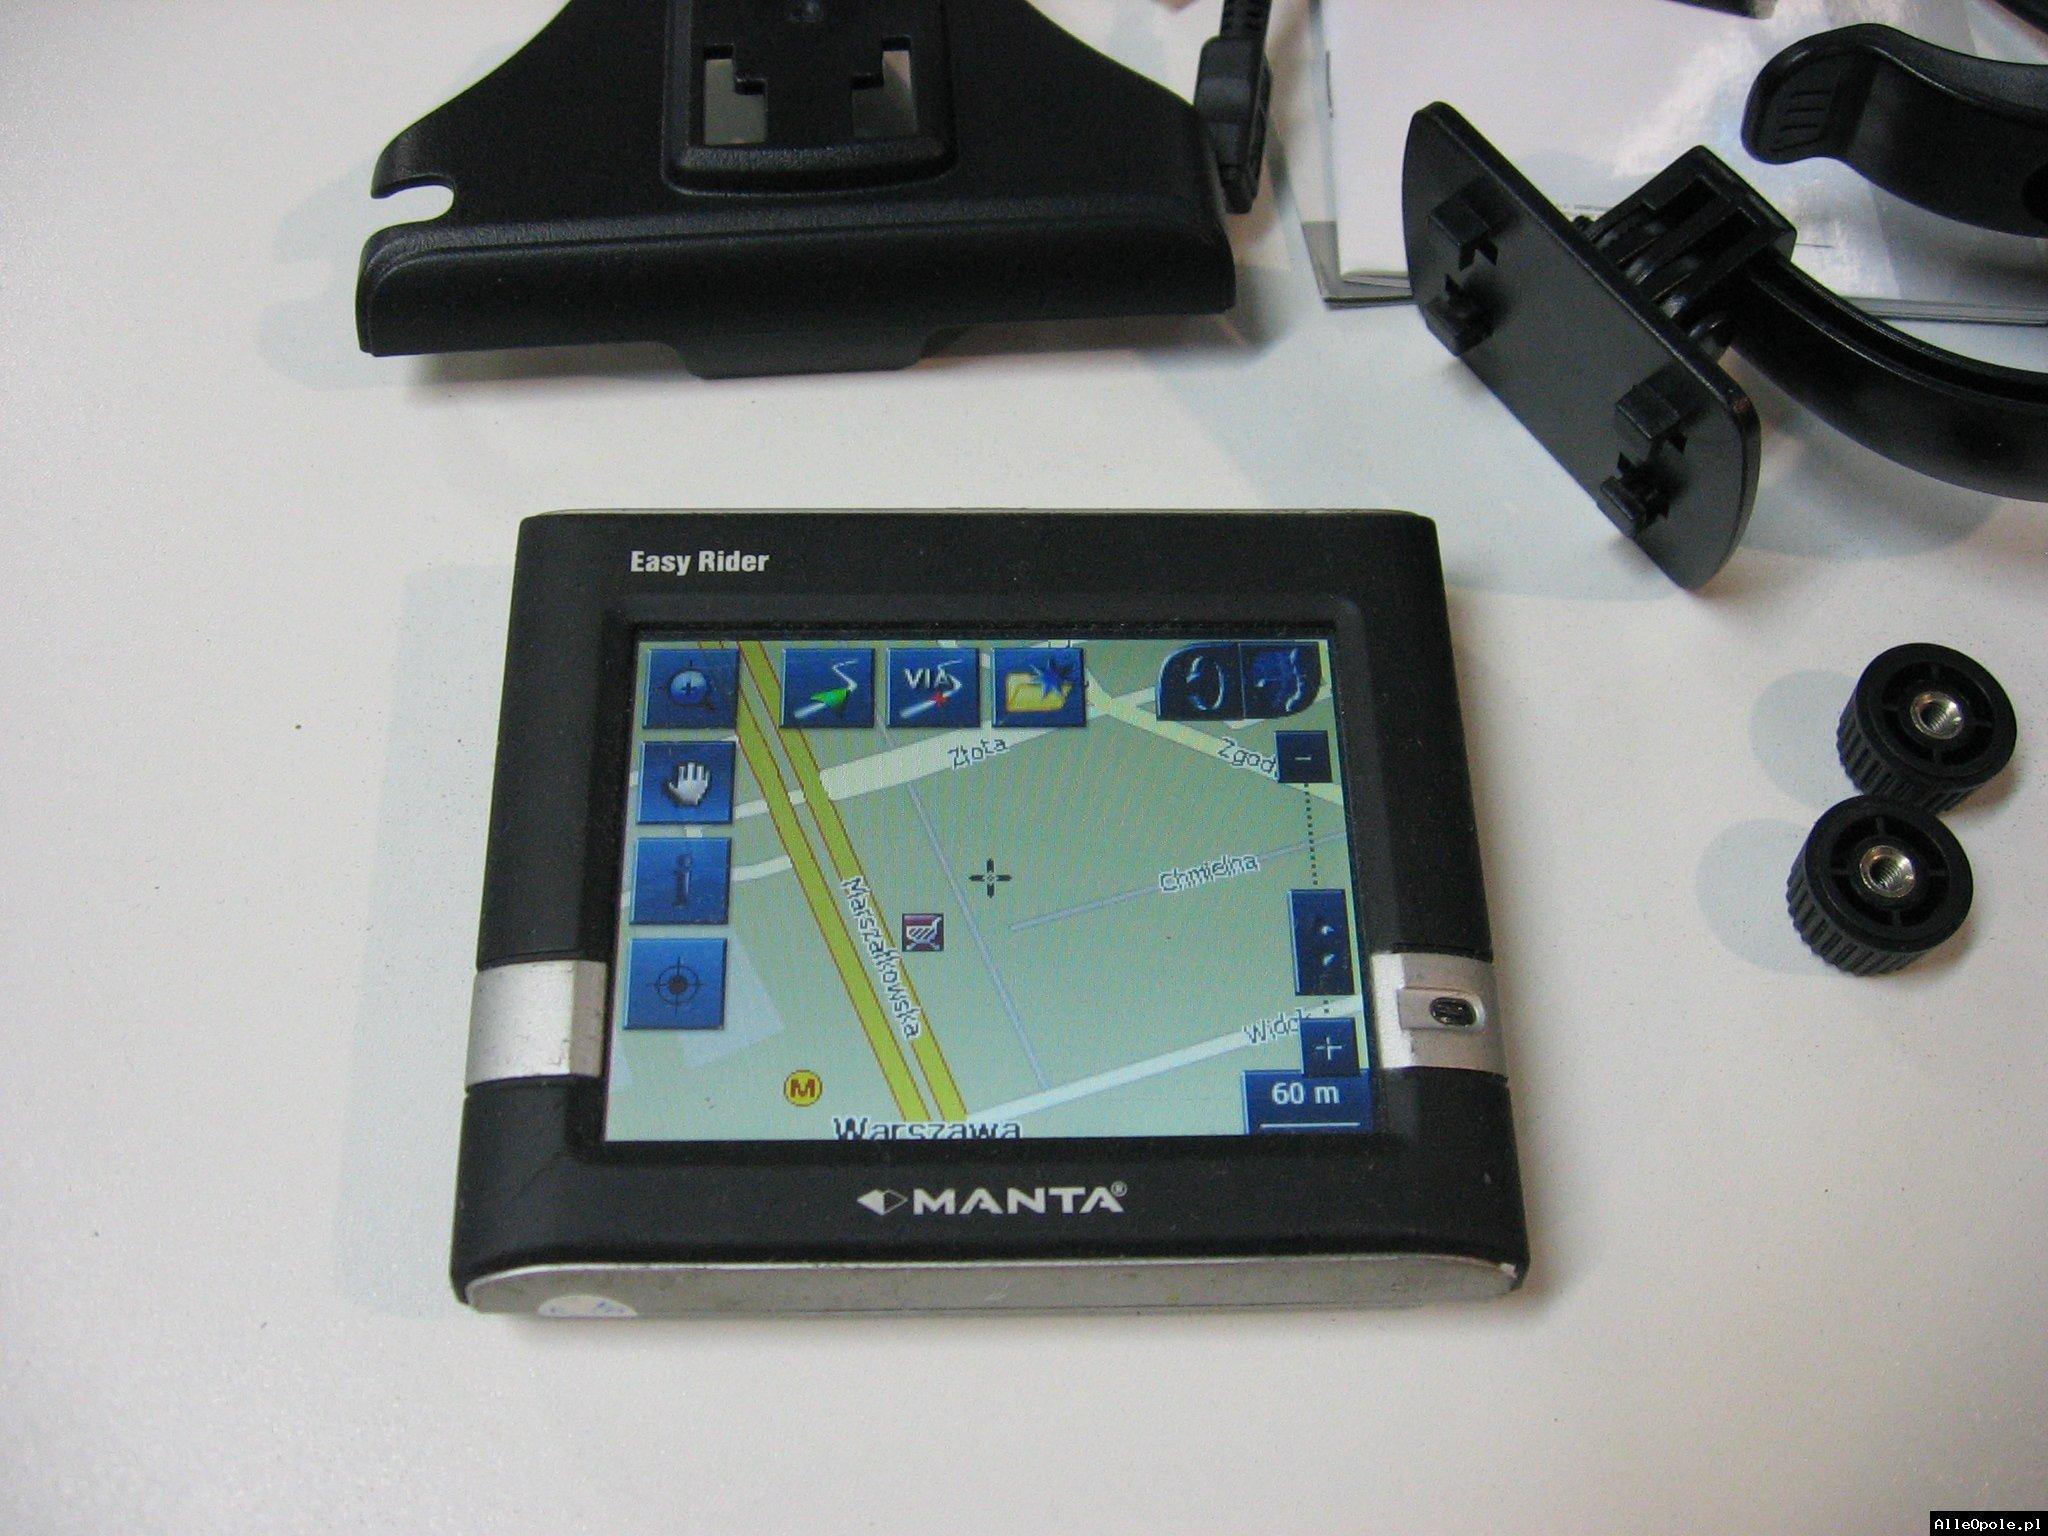 NAWIGACJA MANTA GPS-060 EASY RIDER - Opole